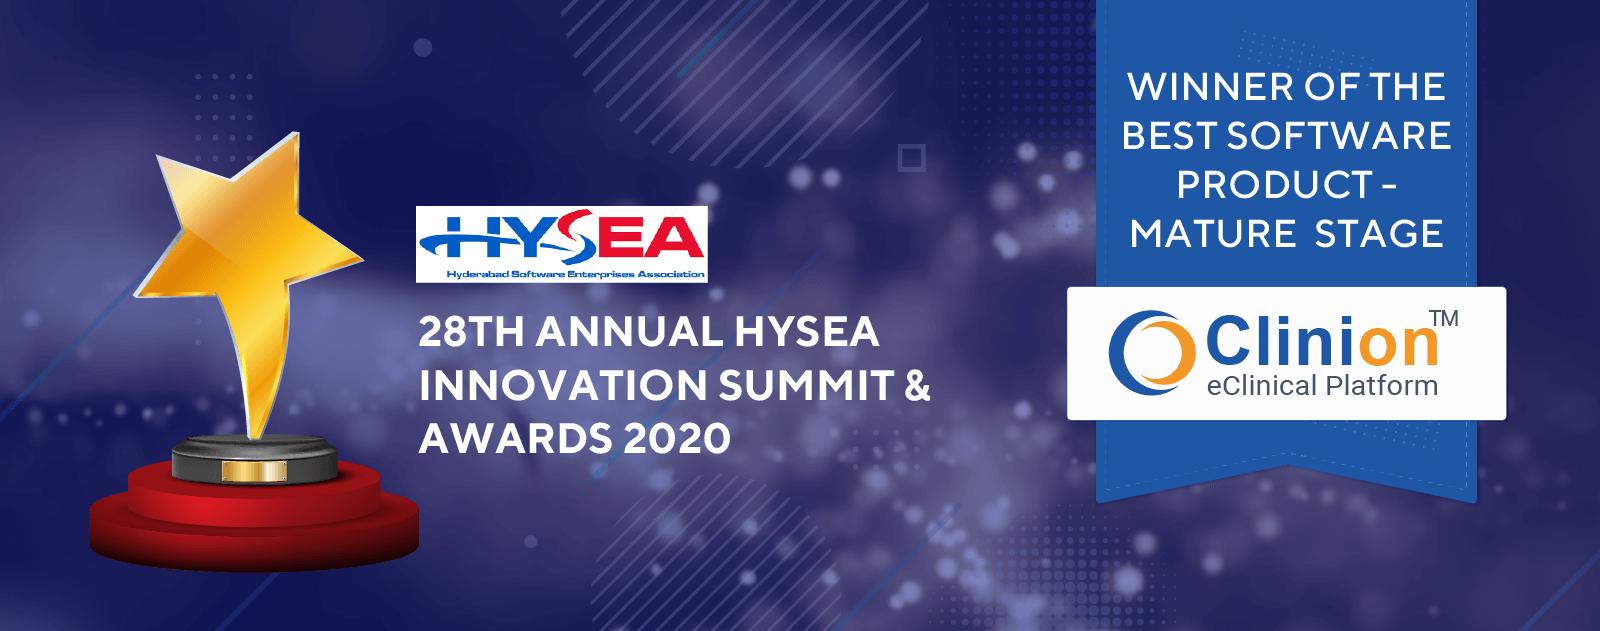 Hysea Awards 2020